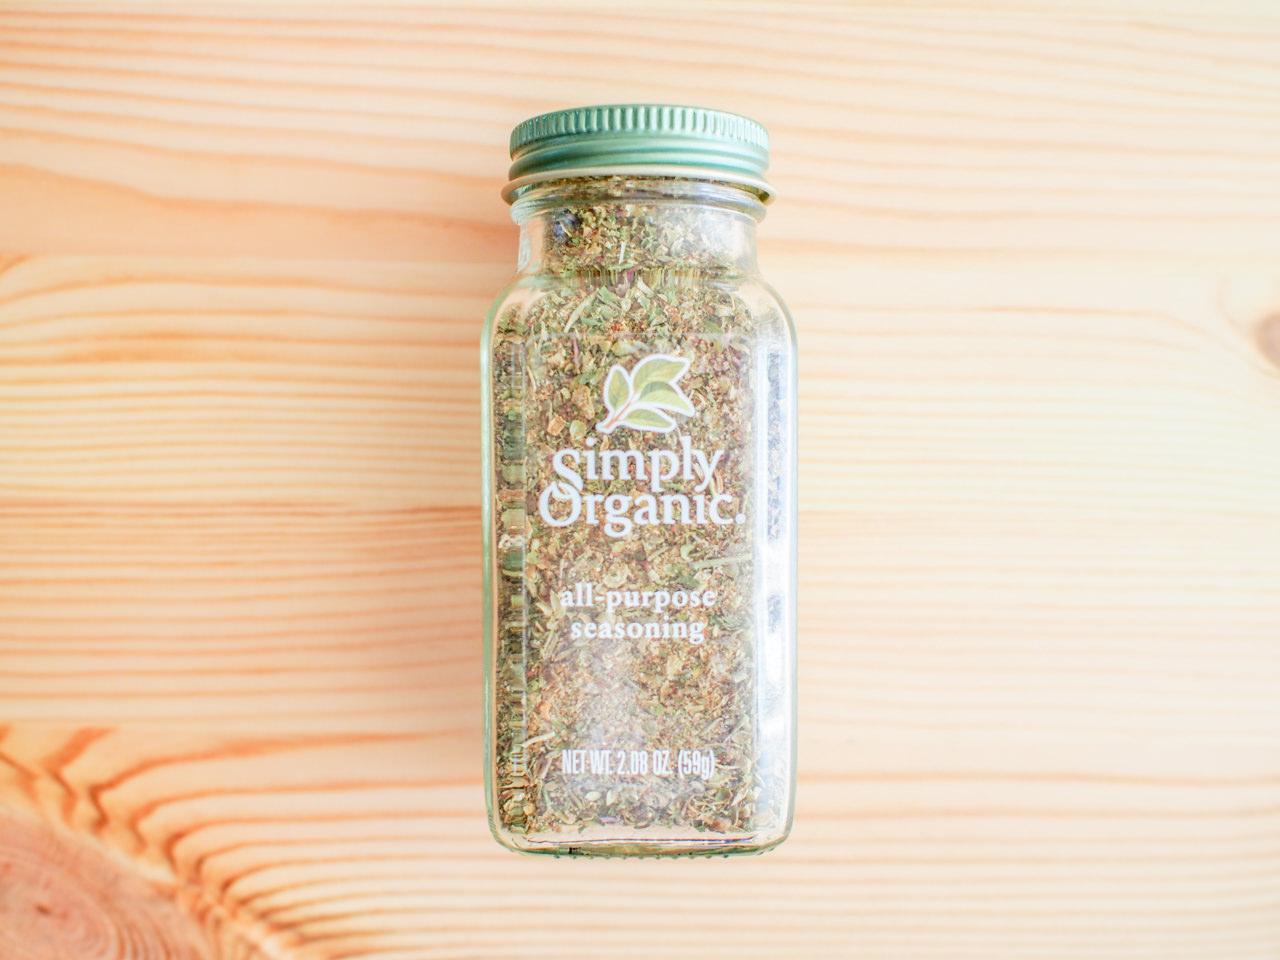 Simply Organic 万能シーズニング調味料